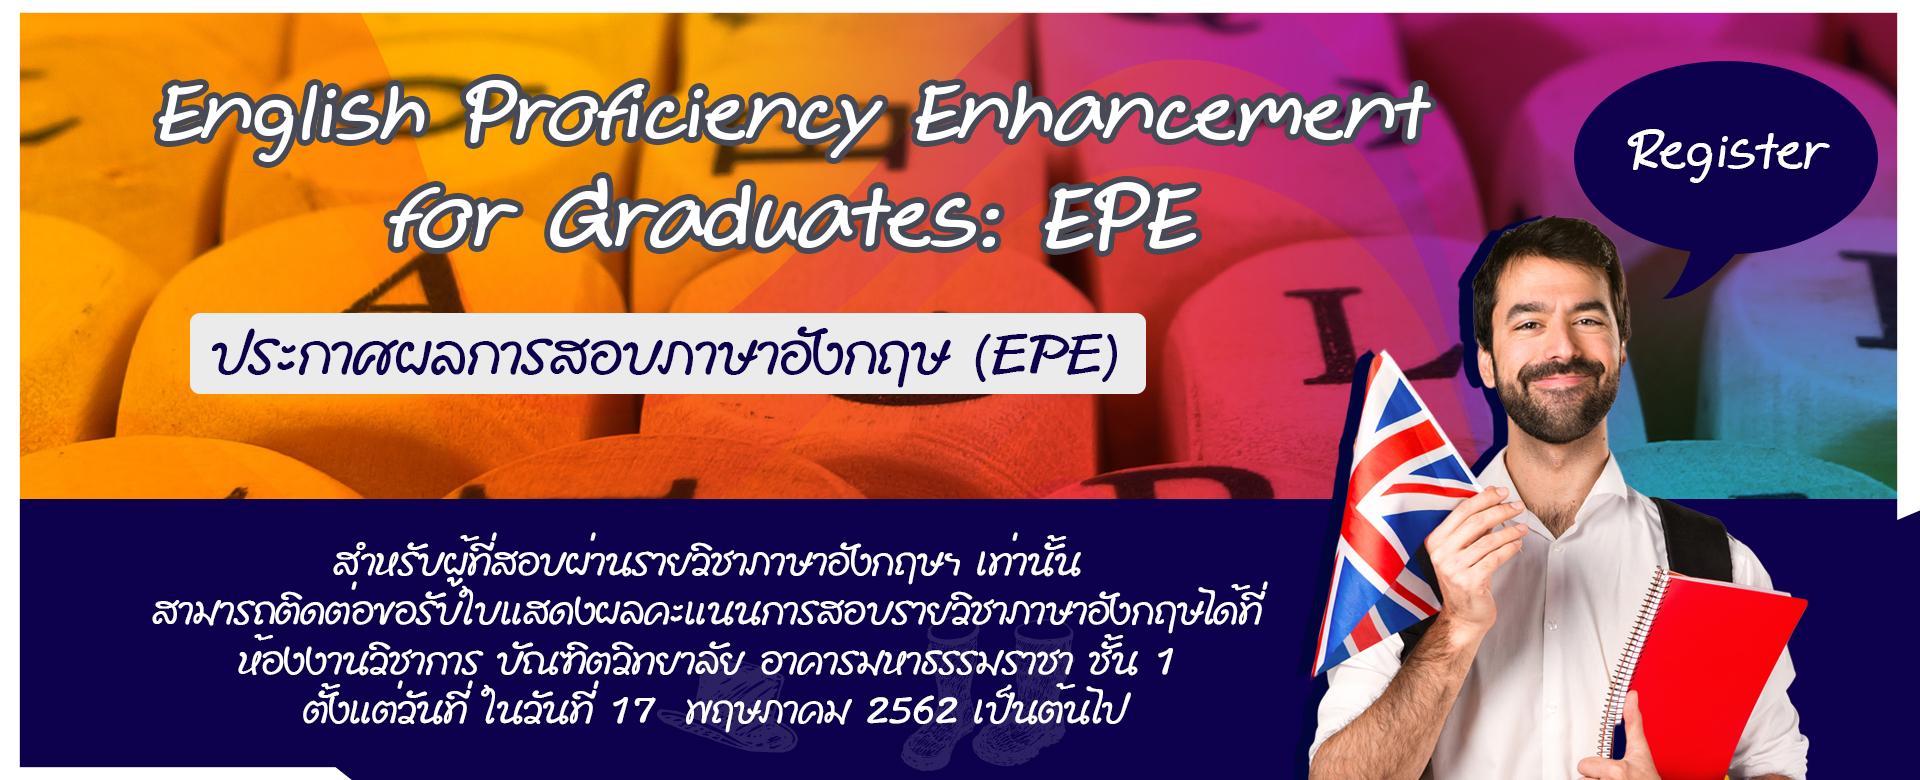 Register English Proficiency Enhancement for Graduates : EPE